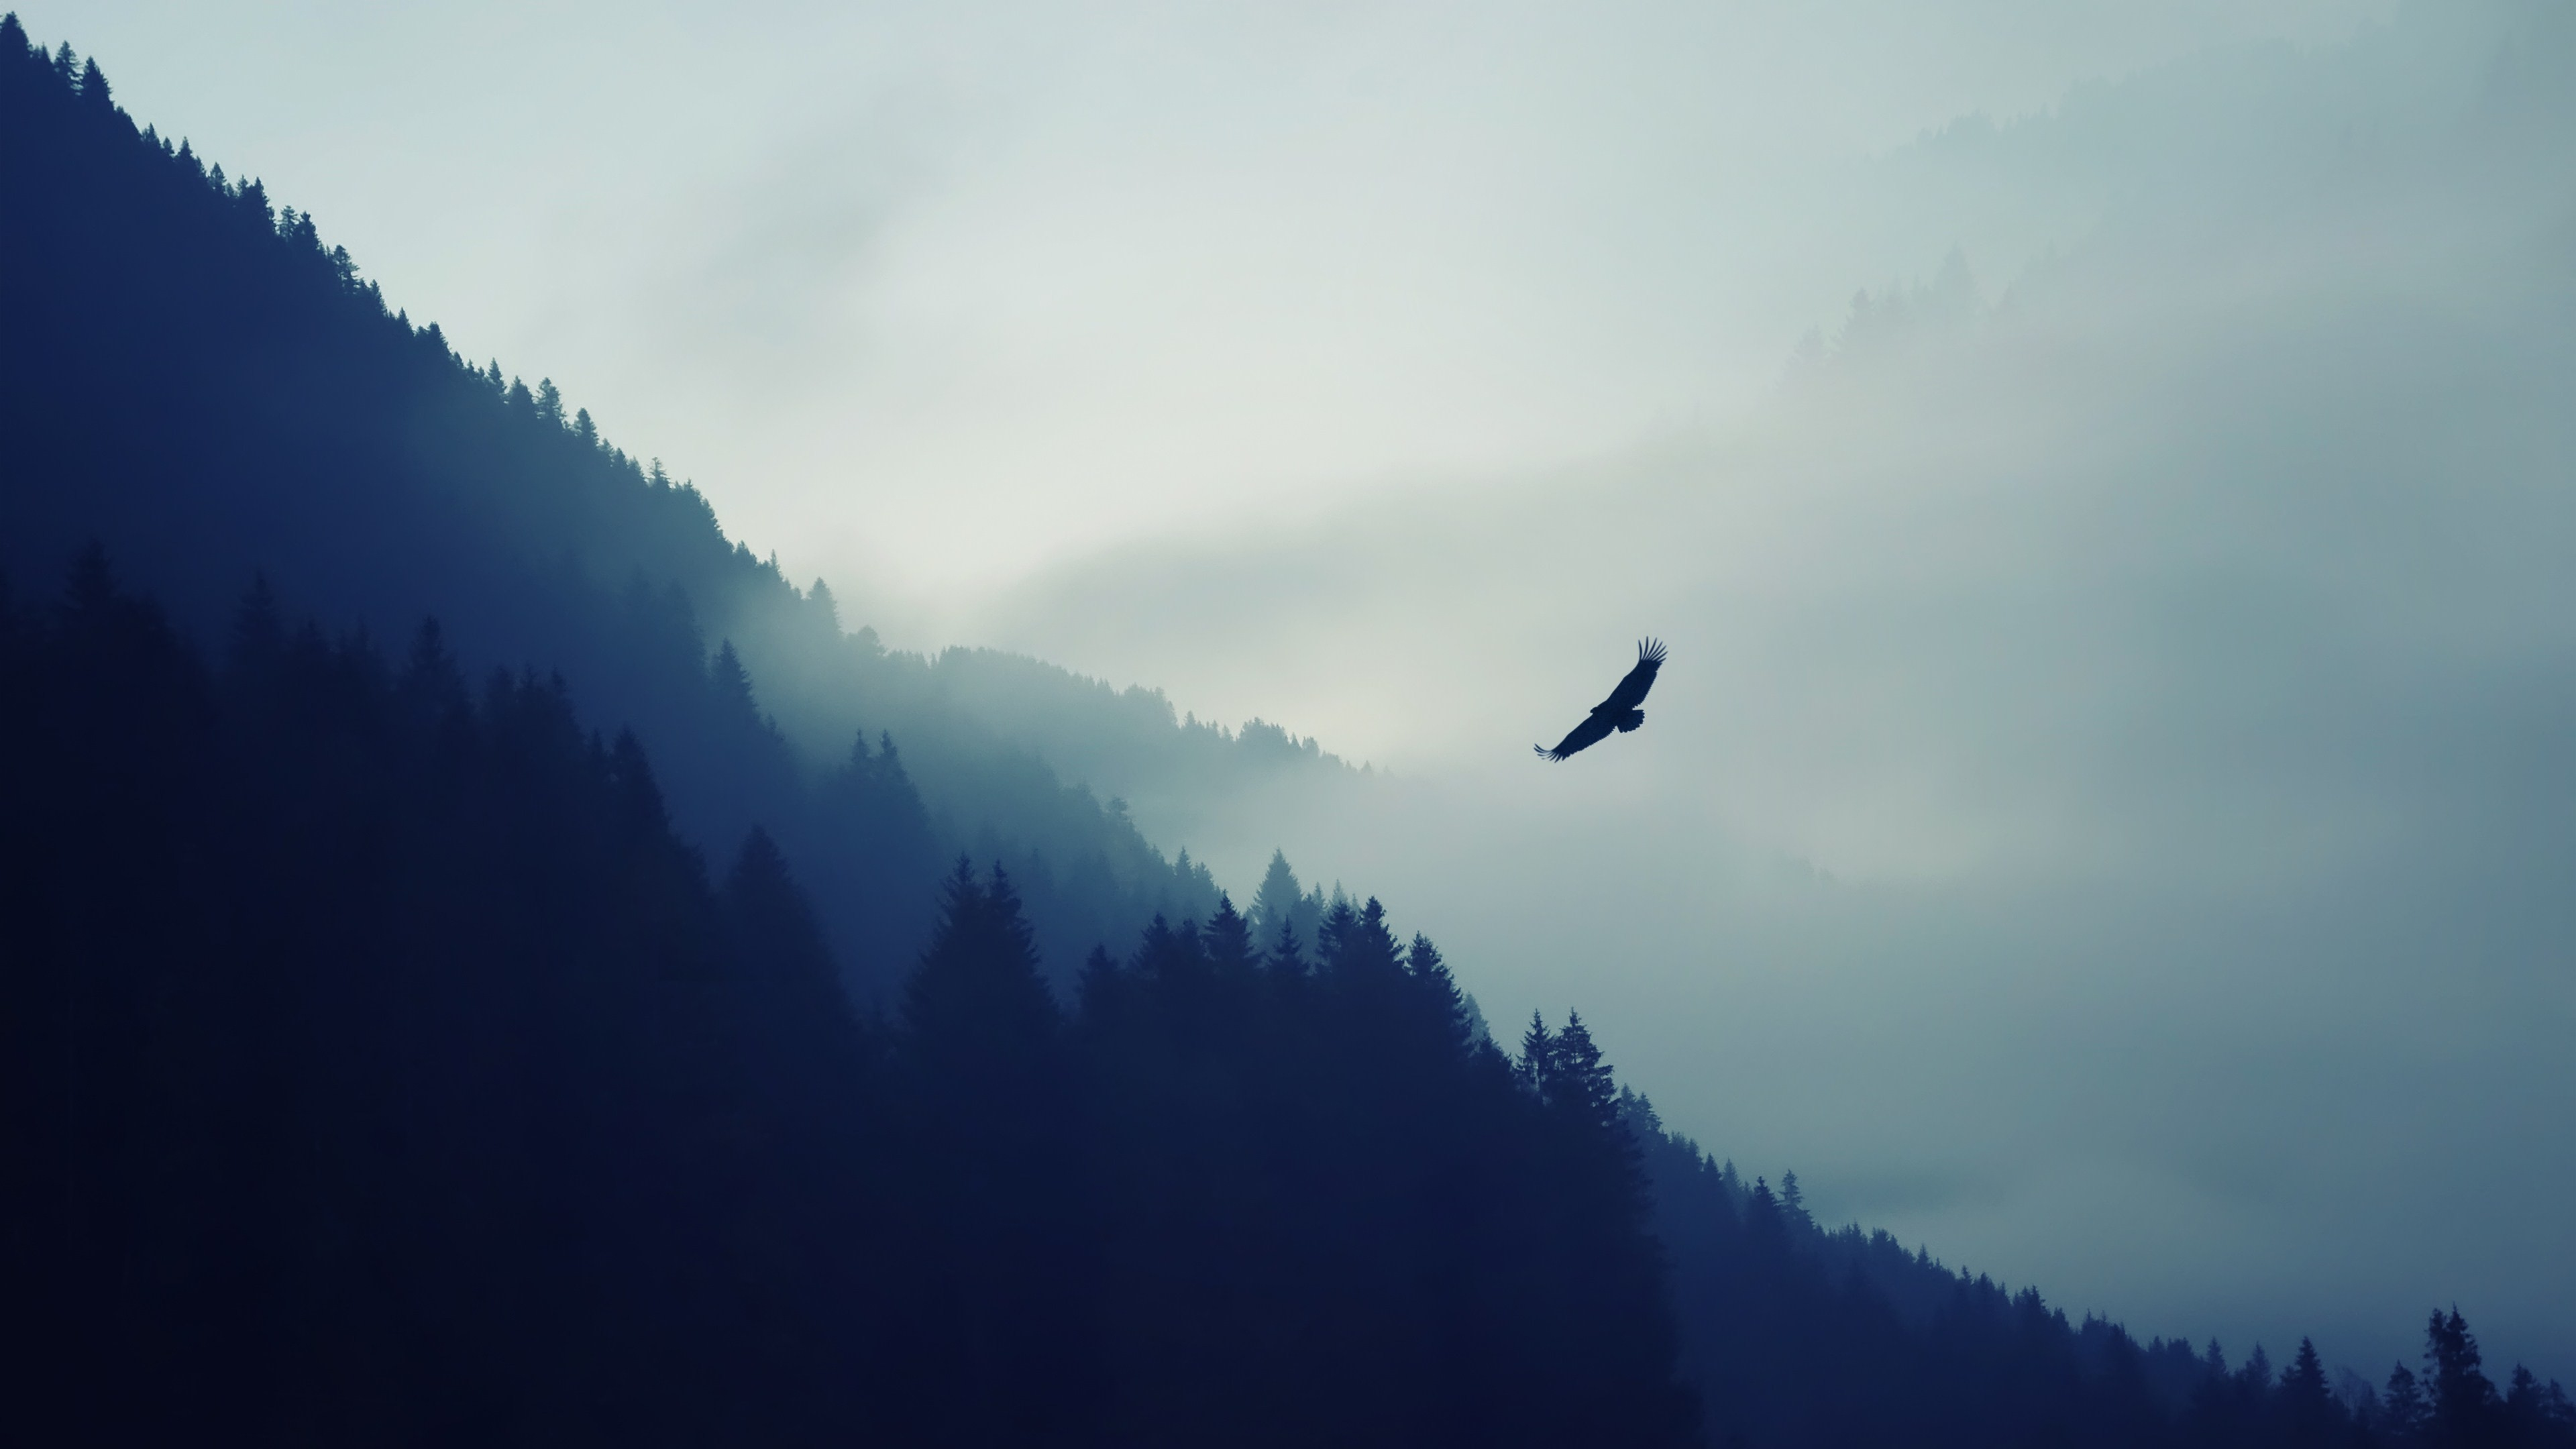 nature mountain eagle fog landscape ultrahd 4k wallpaper wallpaper